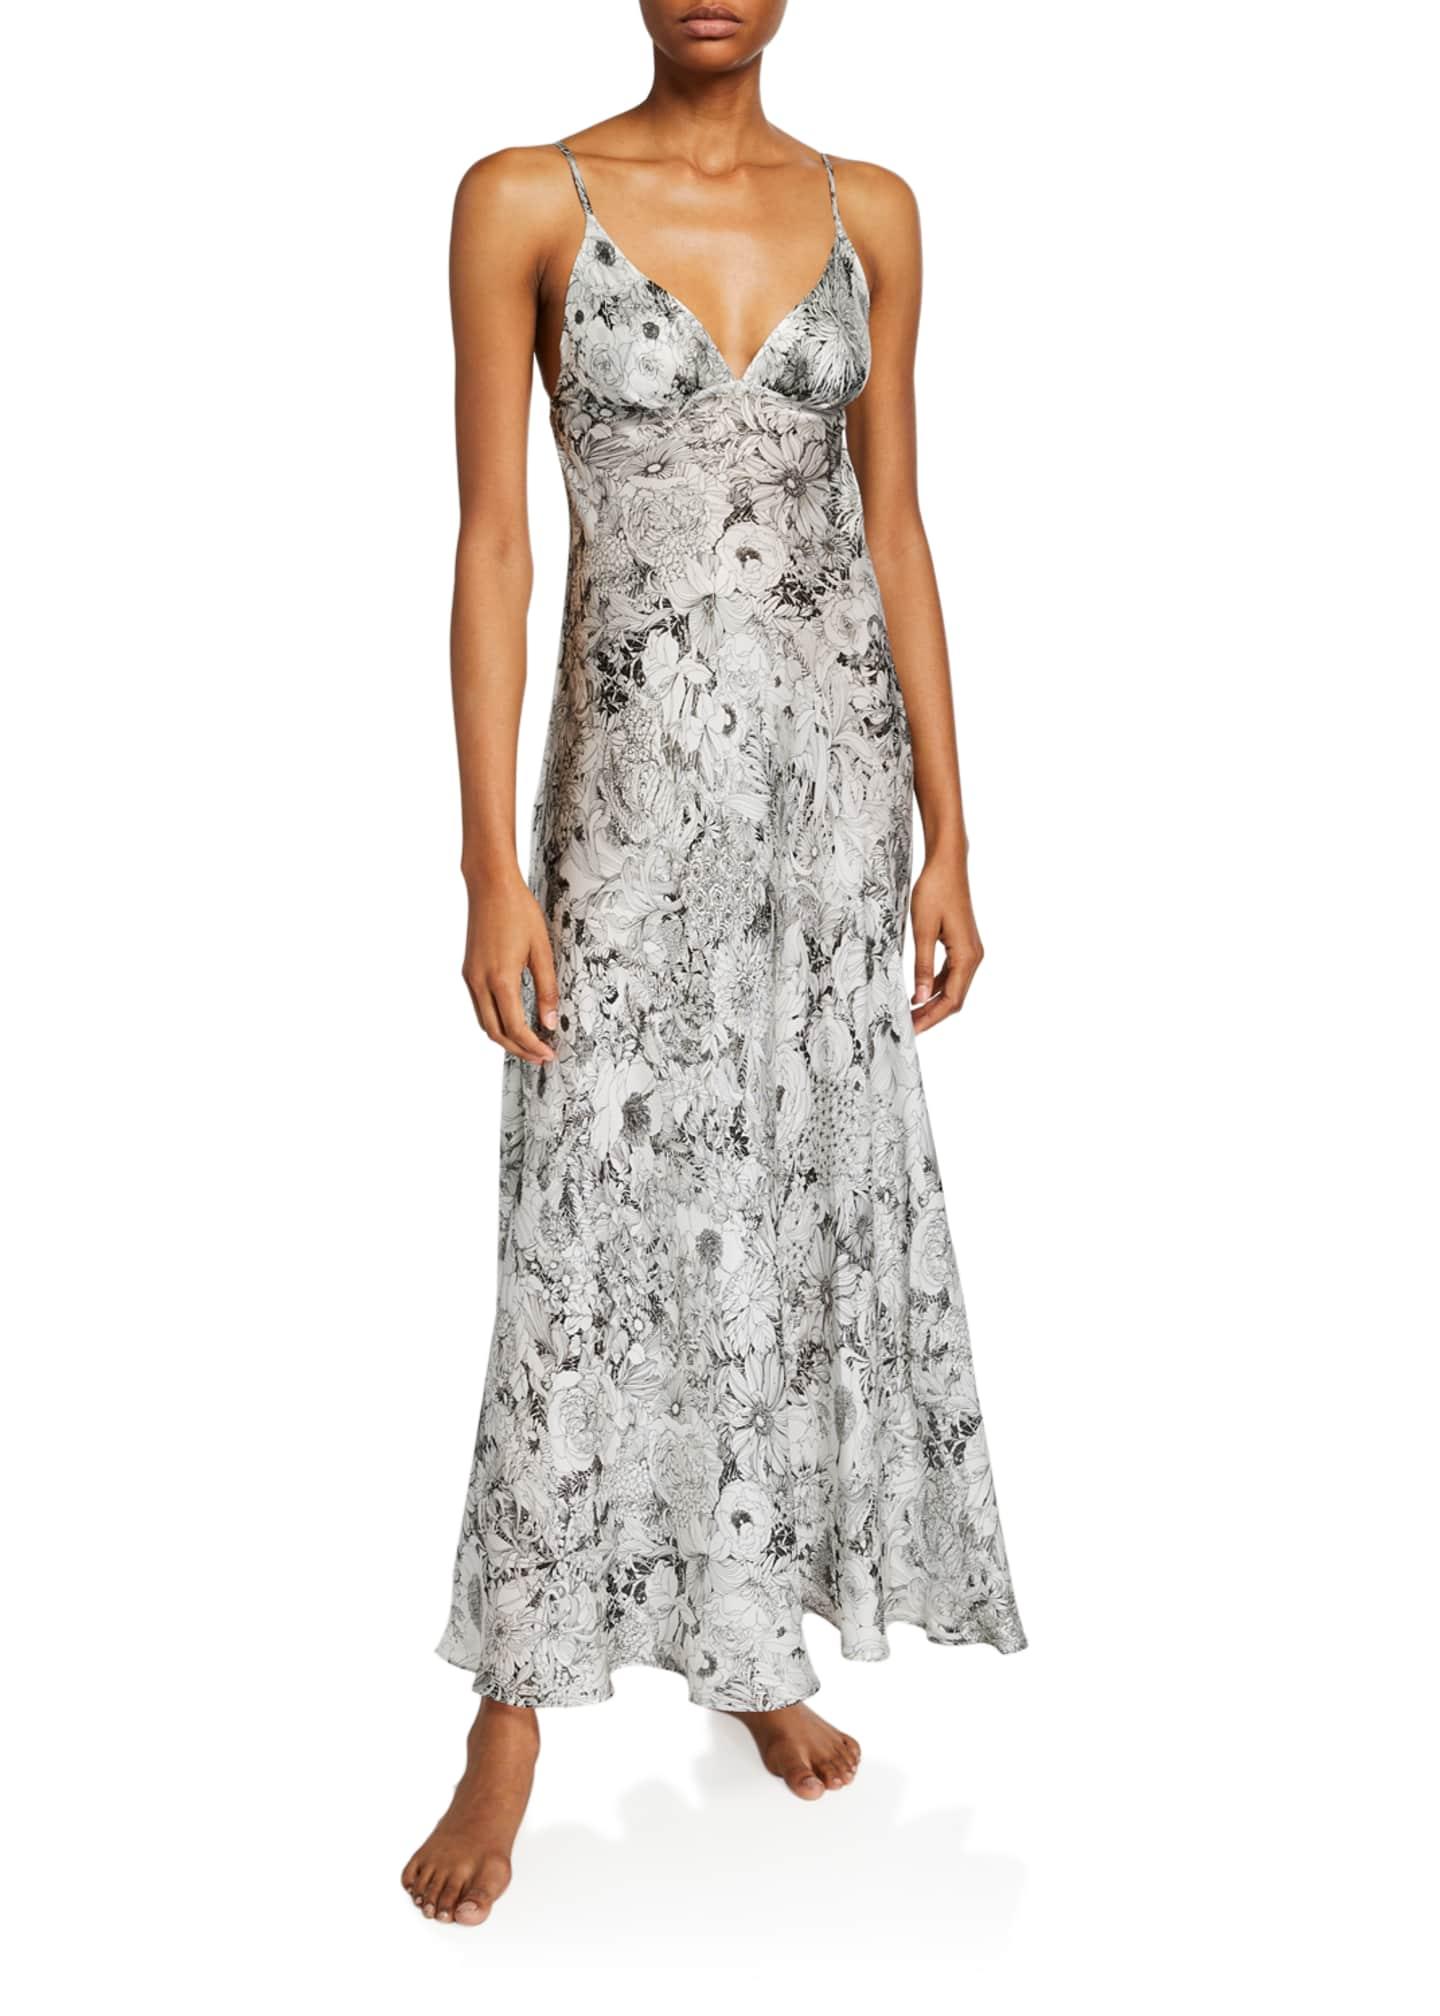 Christine Lingerie Arabella Floral-Print Long Nightgown